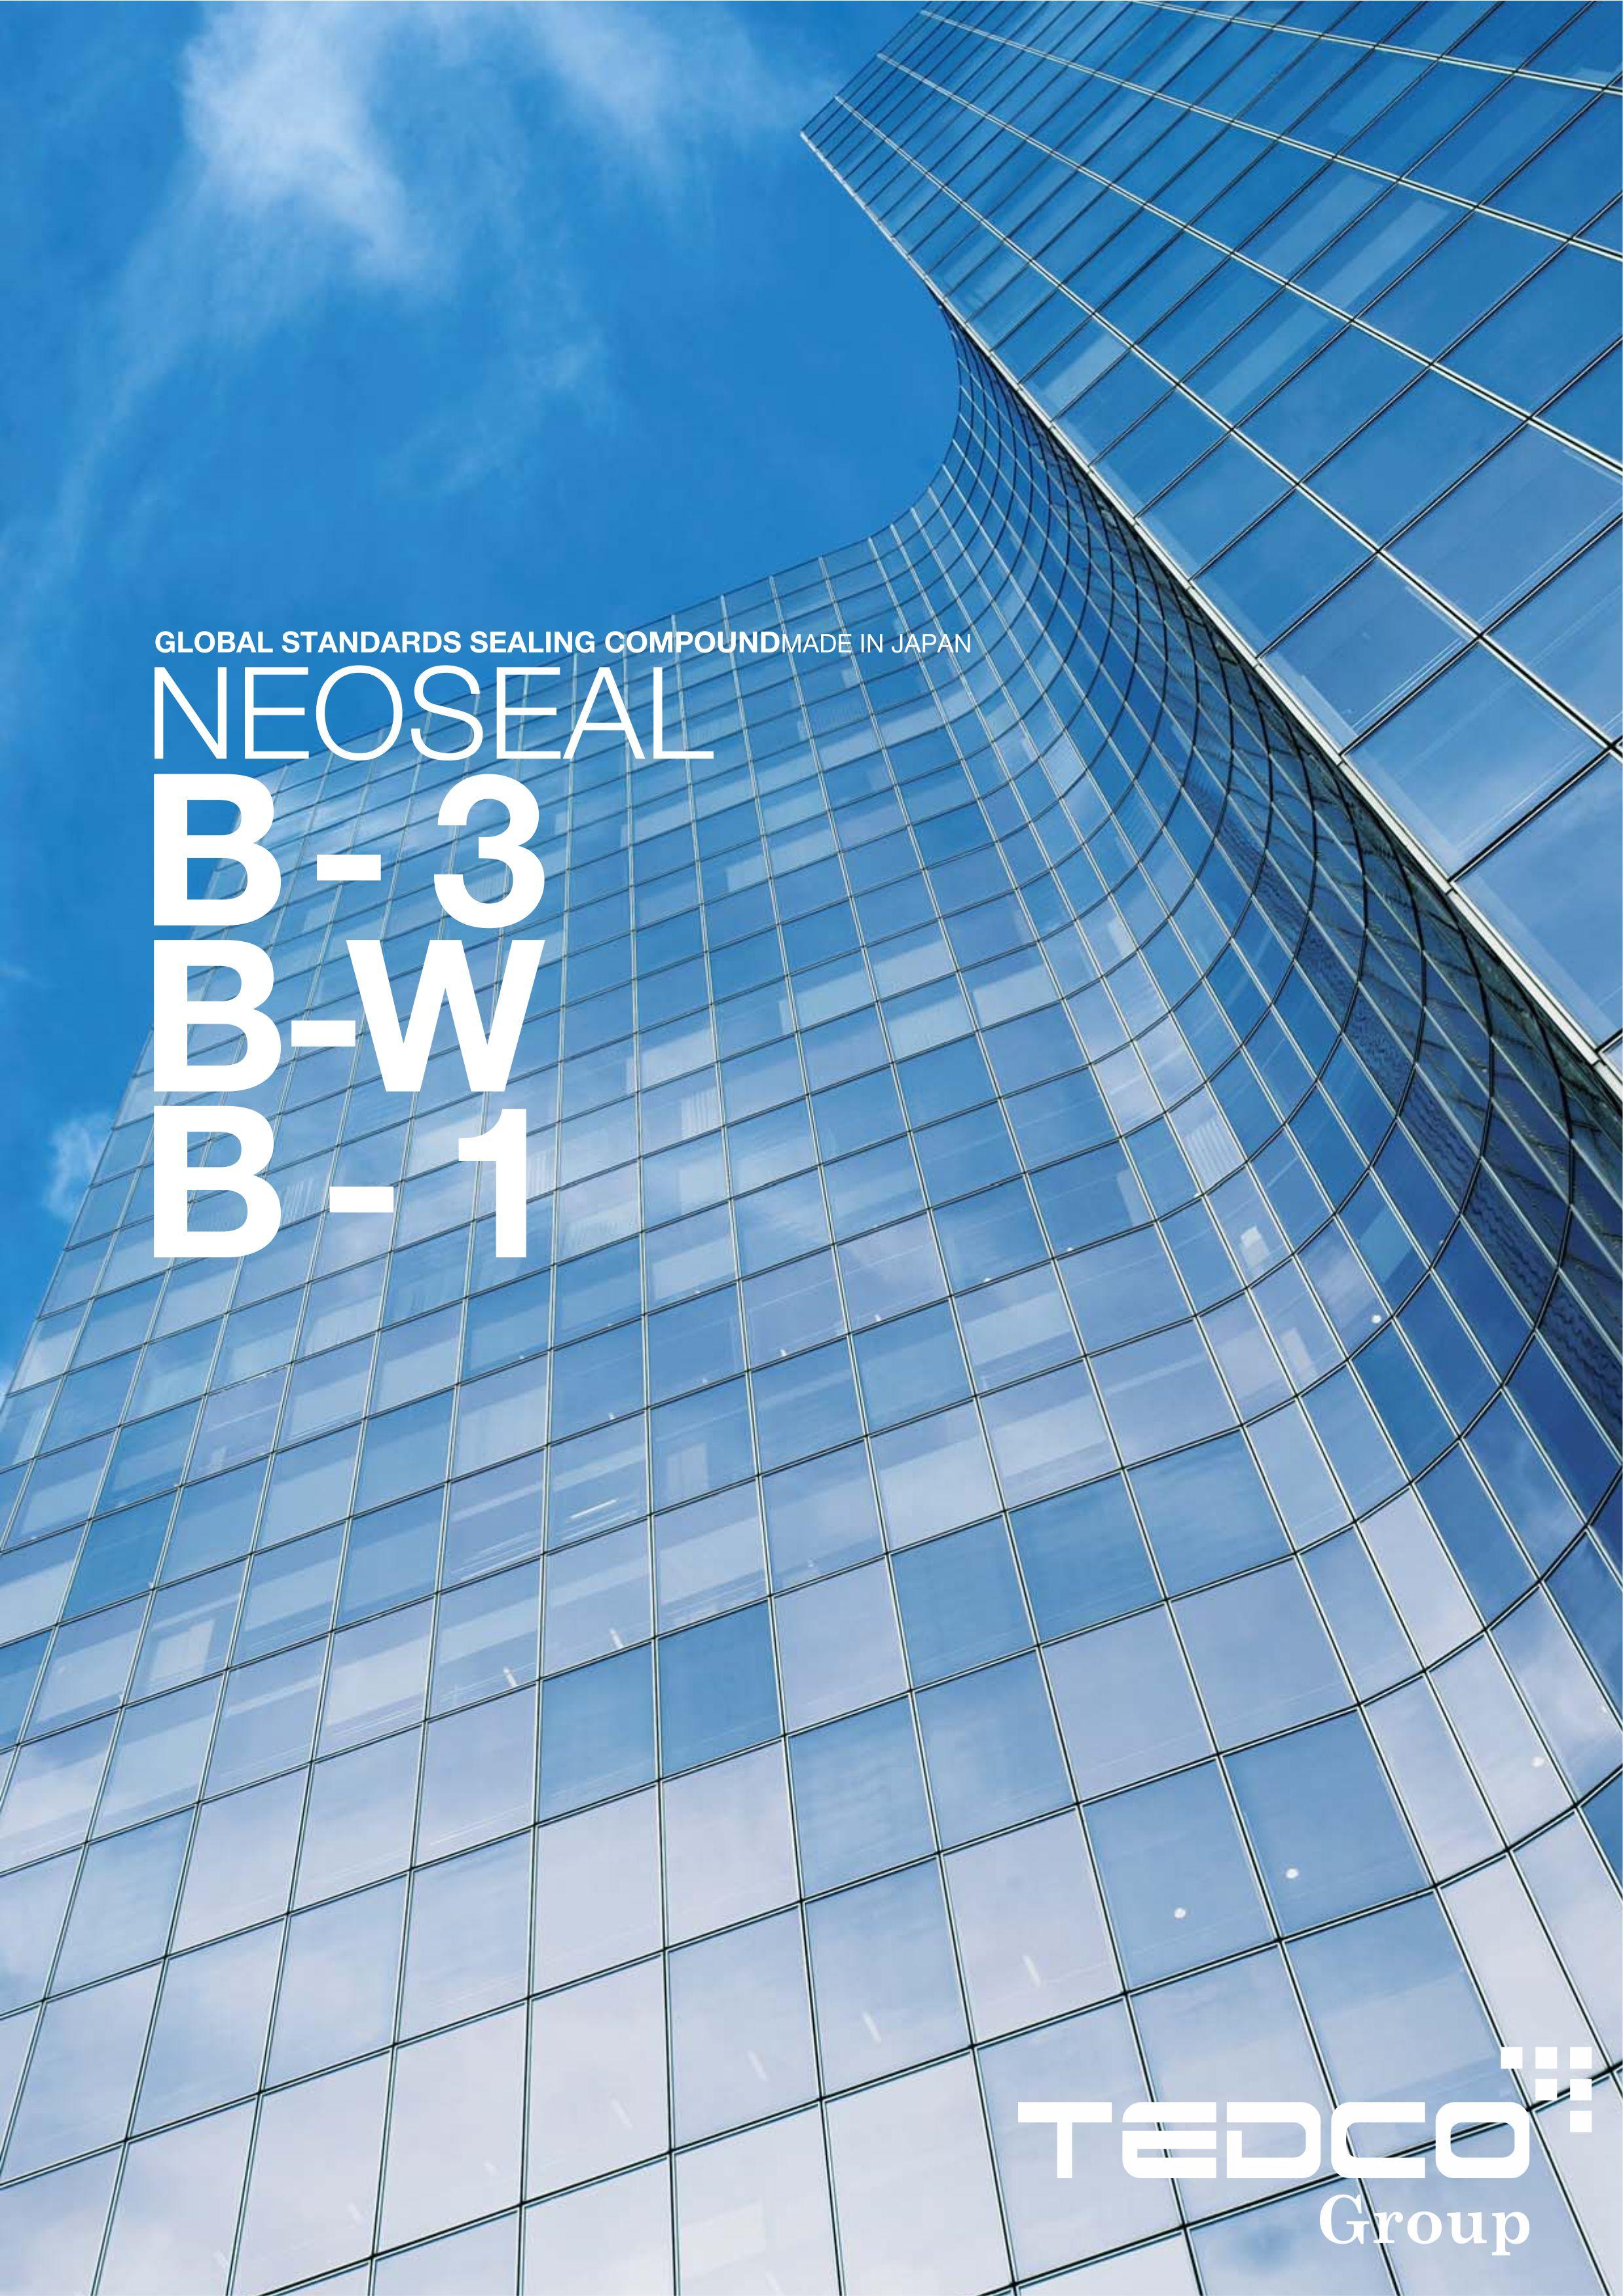 neoseal-p3